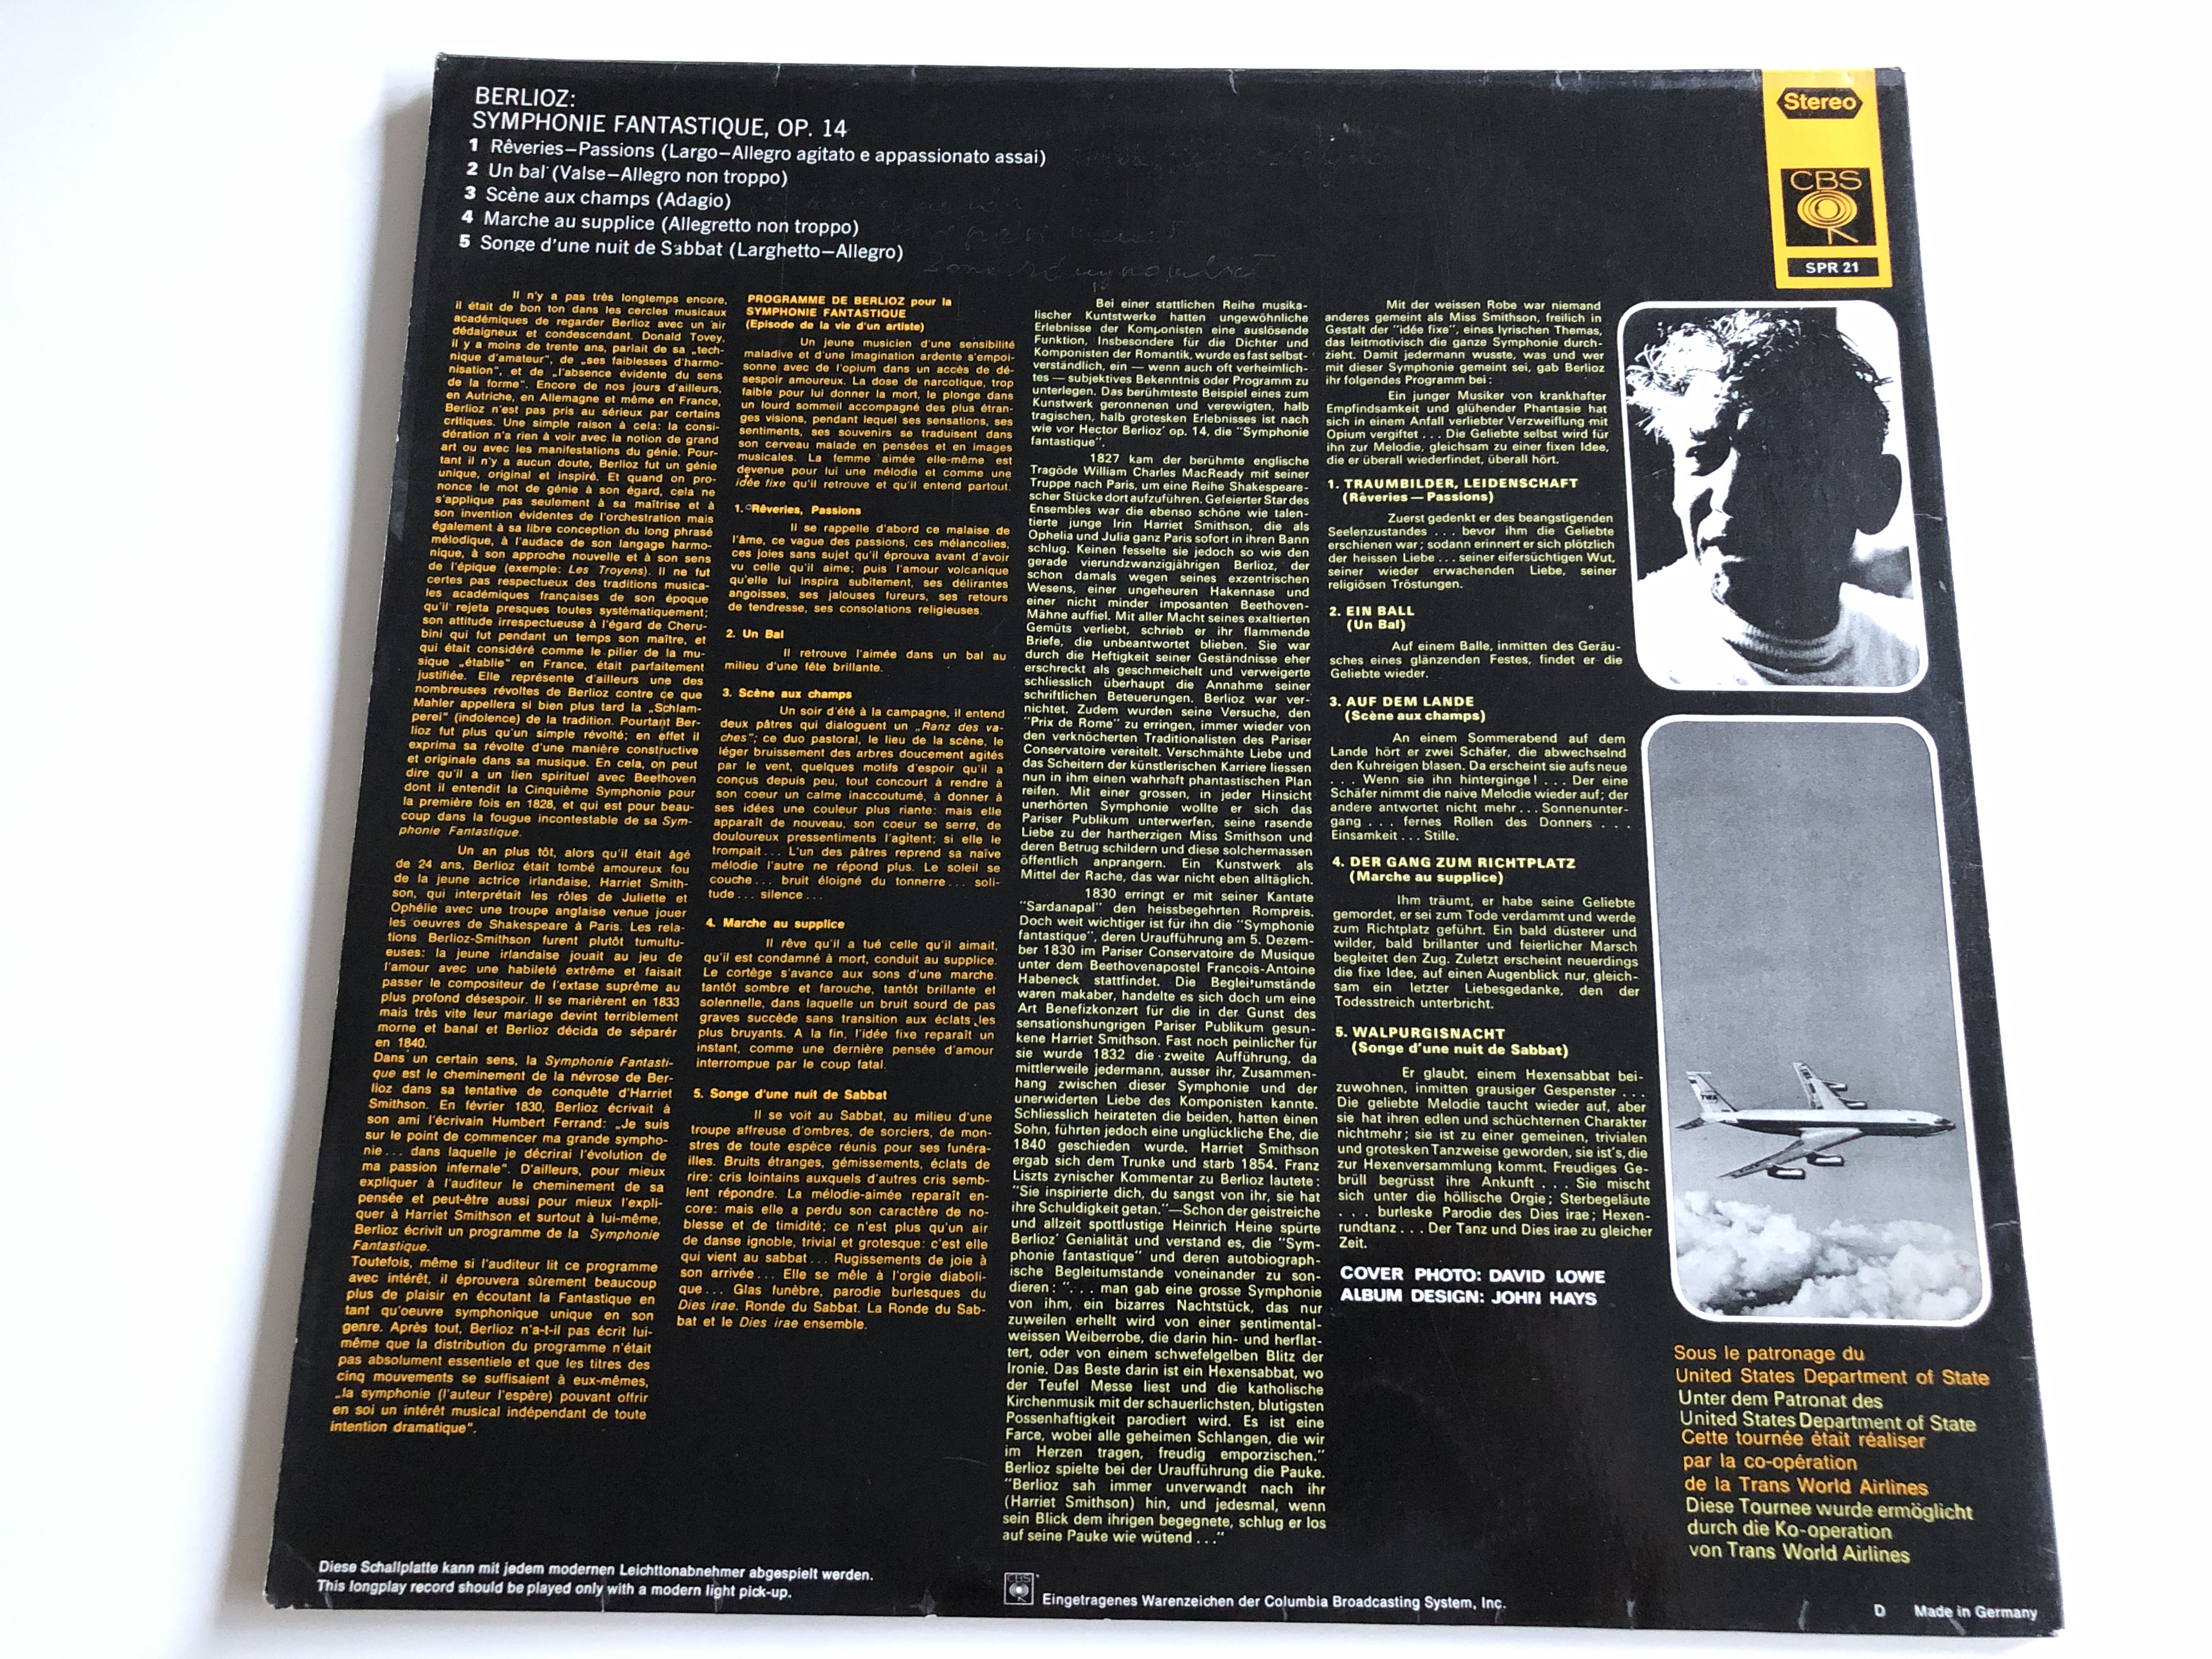 berlioz-symphonie-fantastique-leonard-bernstein-new-york-philharmonic-cbs-lp-stereo-spr-21-4-.jpg